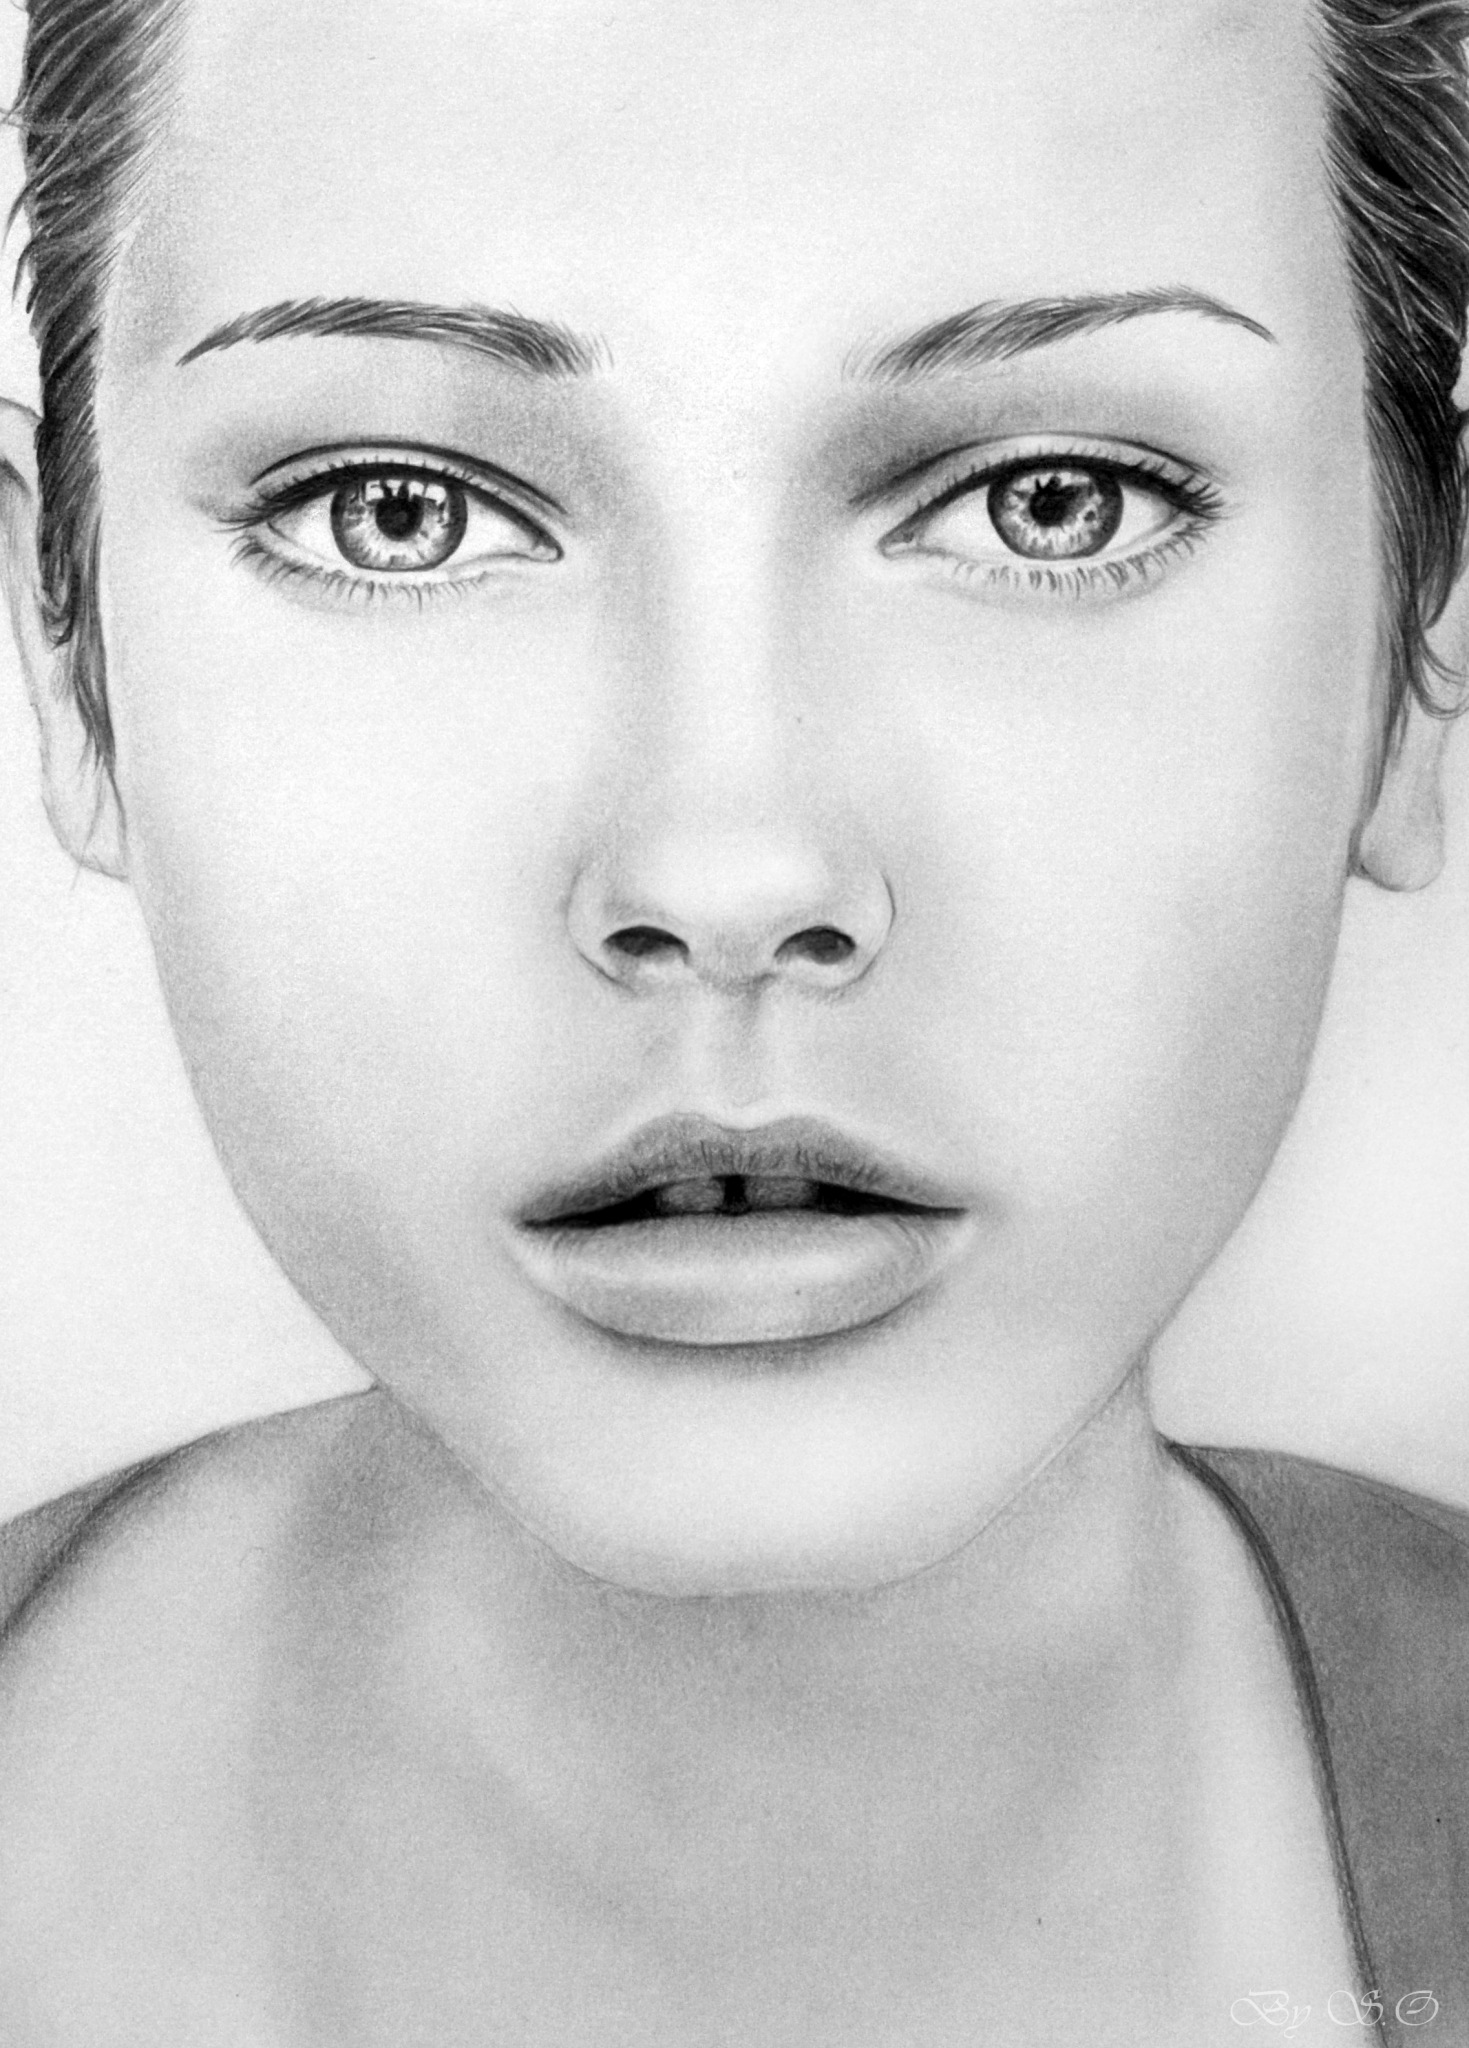 портрет карандашом (1469x2048) нажмите для ...: https://freelance.ru/Nevermind1392?work=1326996